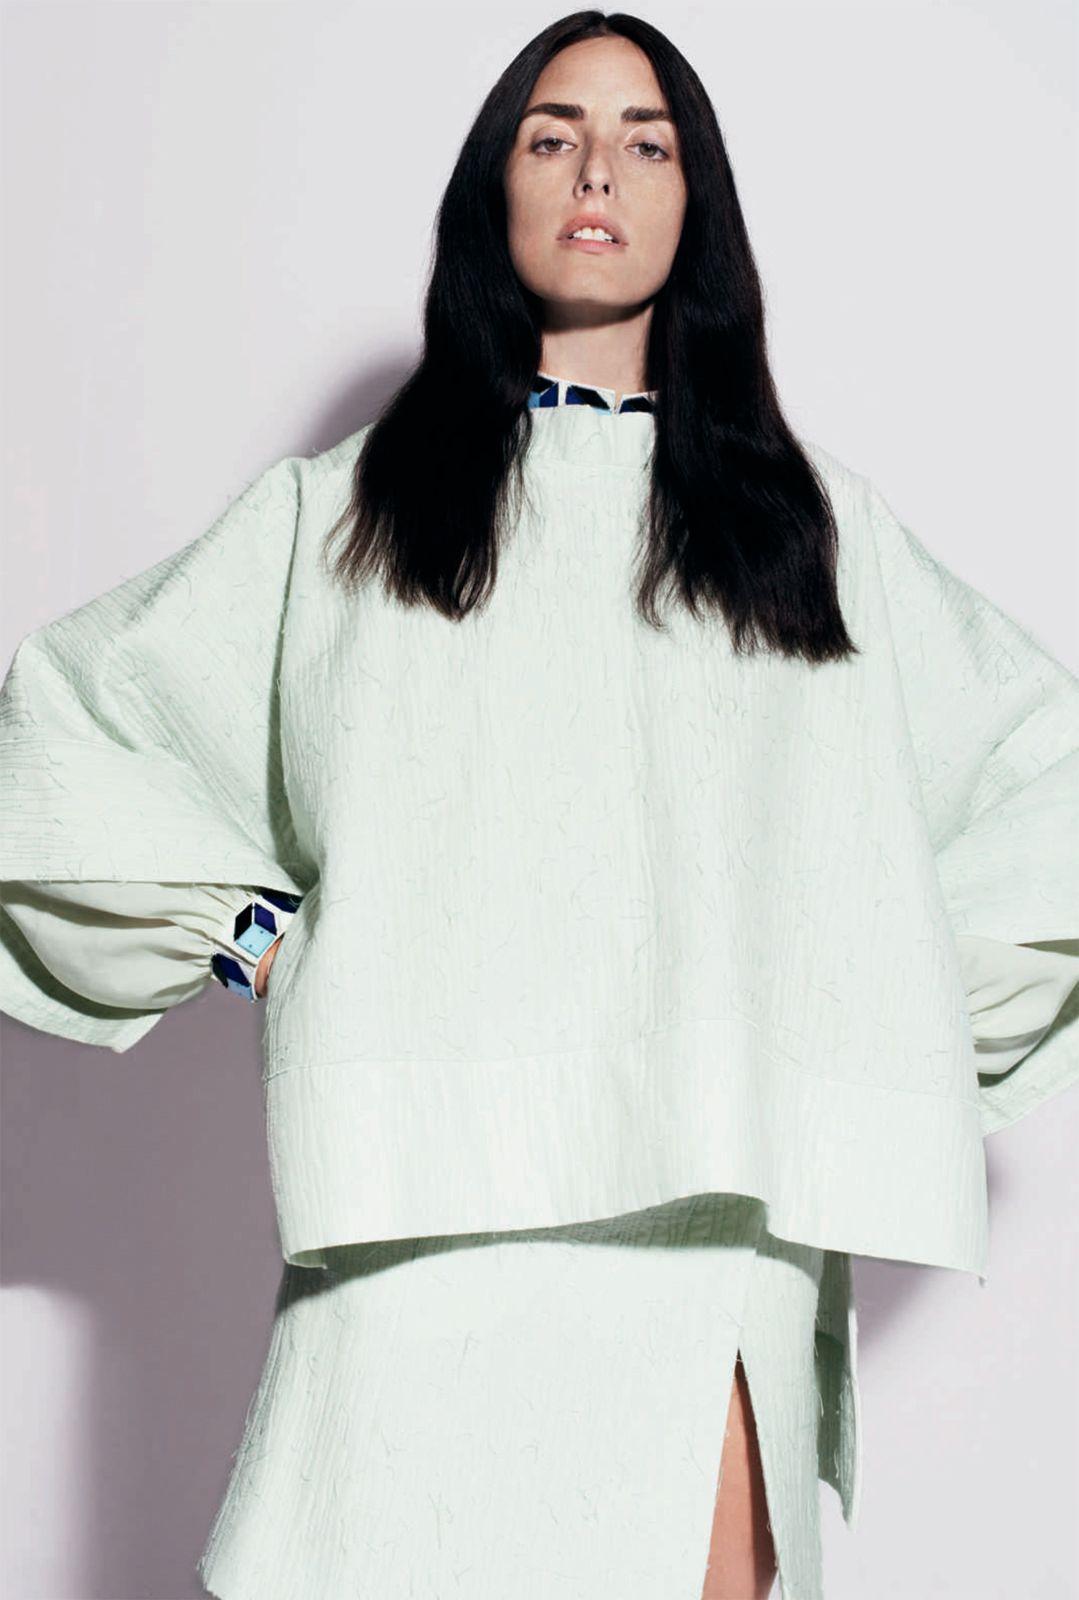 Modele lookbook – Broderies Sonia Rykiel – Perles effet 3D detail col et poignet – Printemps ete 2013 – 1